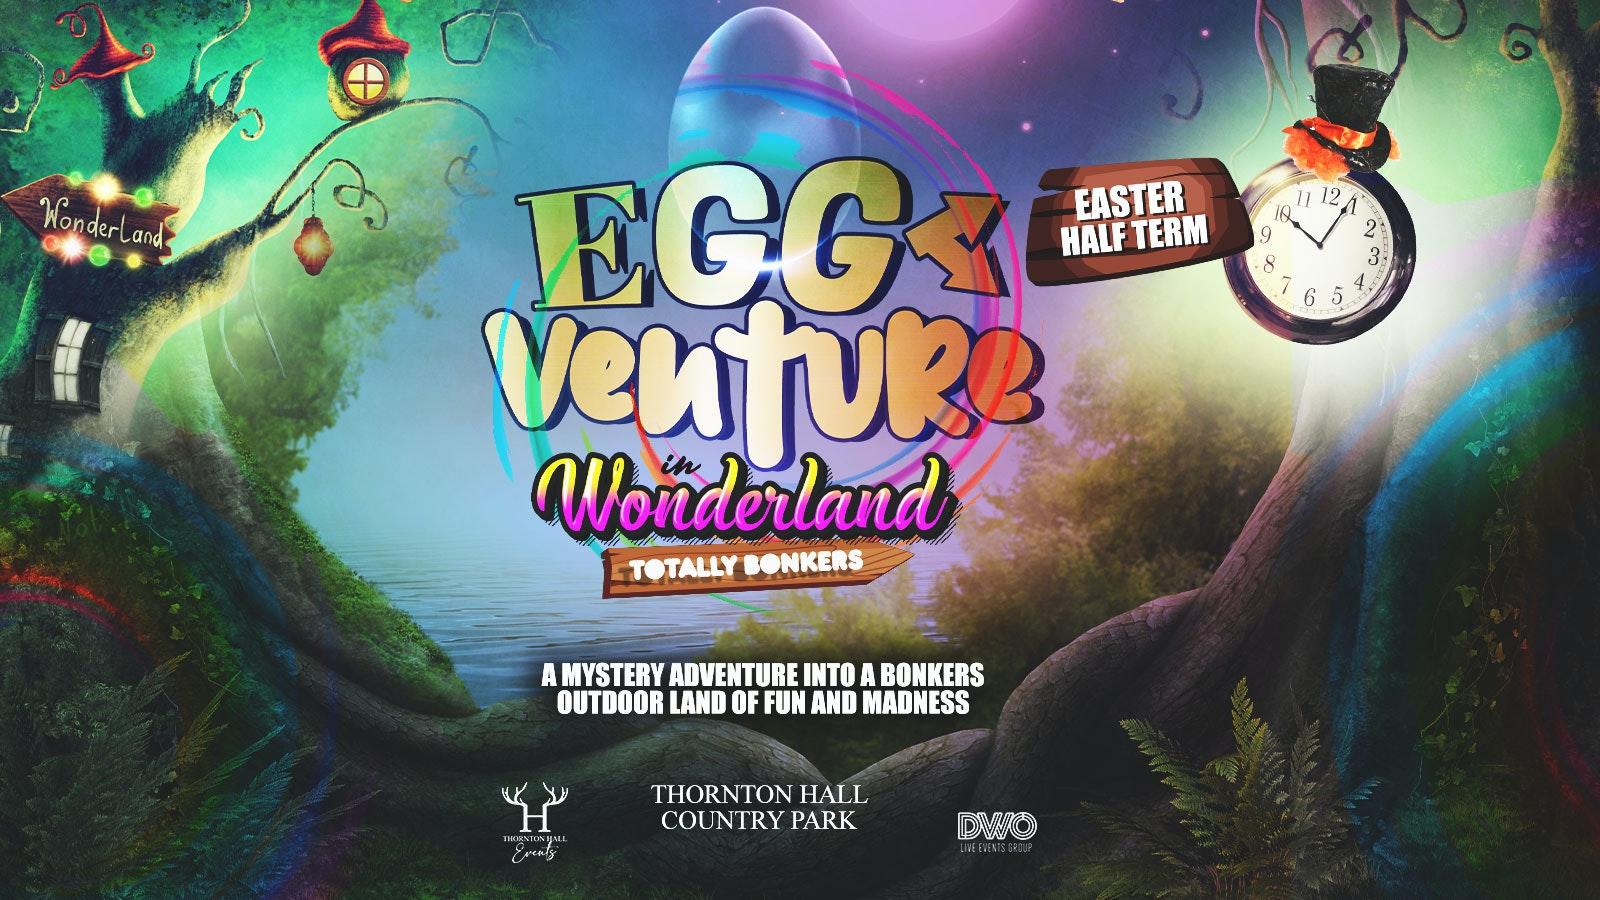 EggVenture in Wonderland –  Sunday 11th April – 10.30am